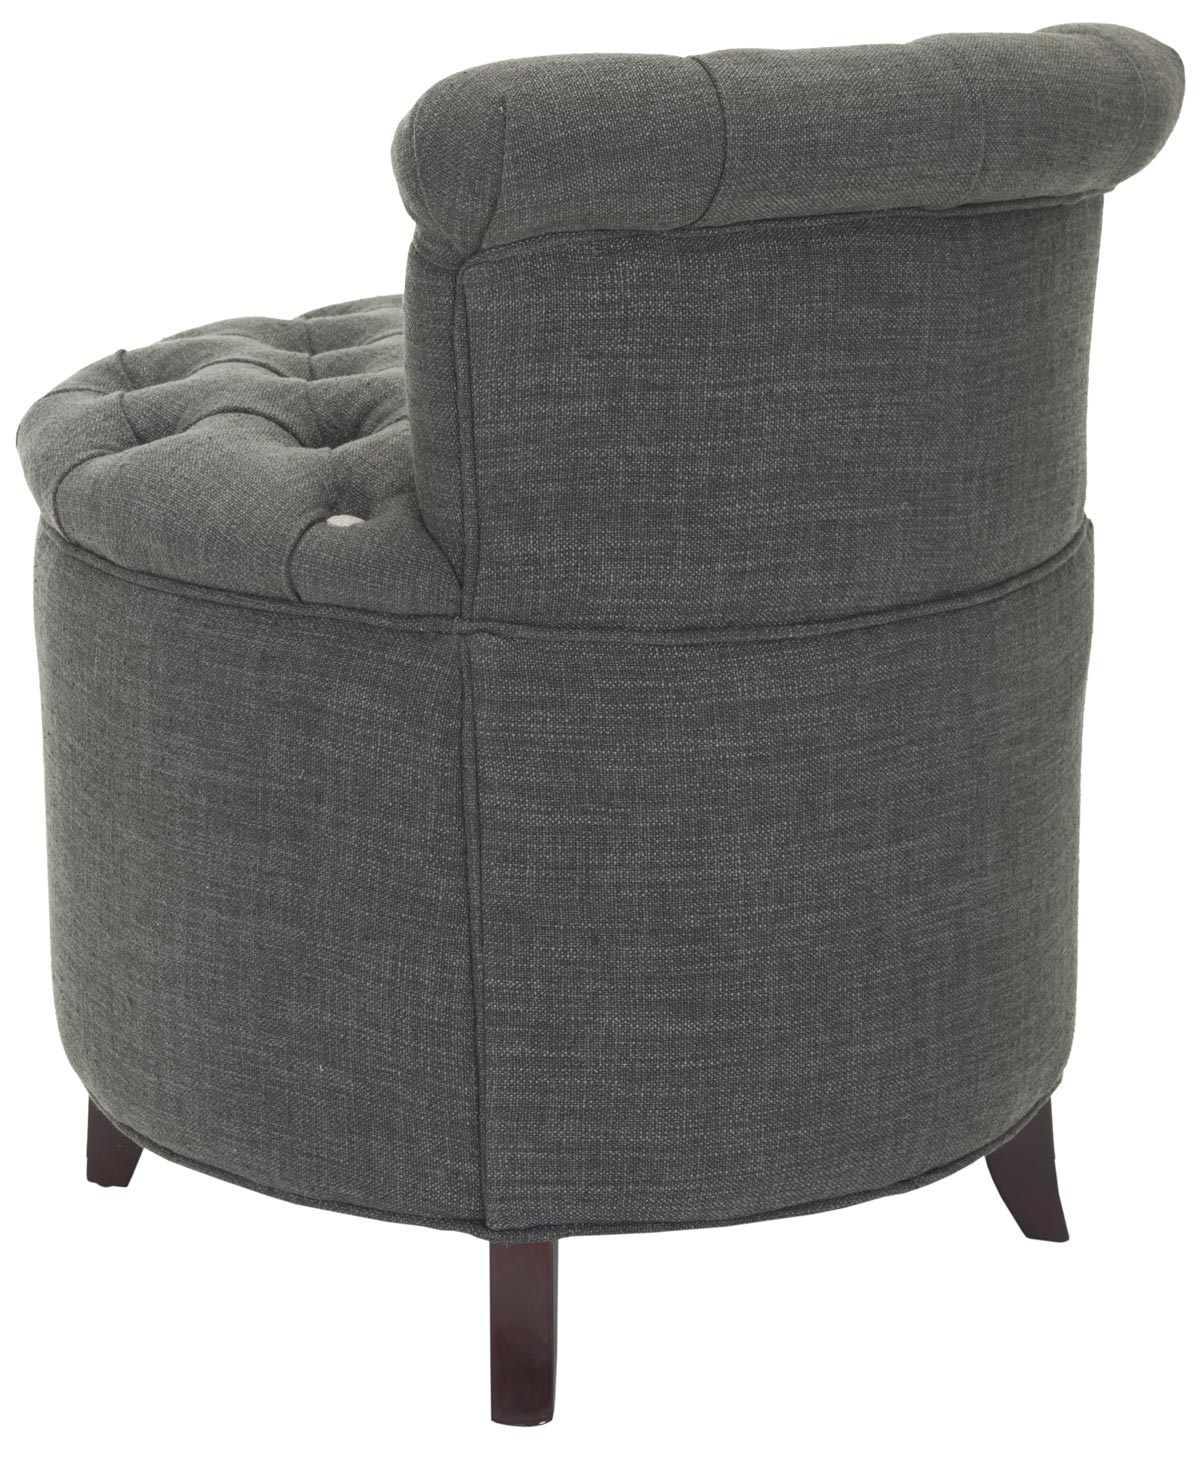 Vanity chair best vanity chair for bathroom with wheels for Vanity chair cheap